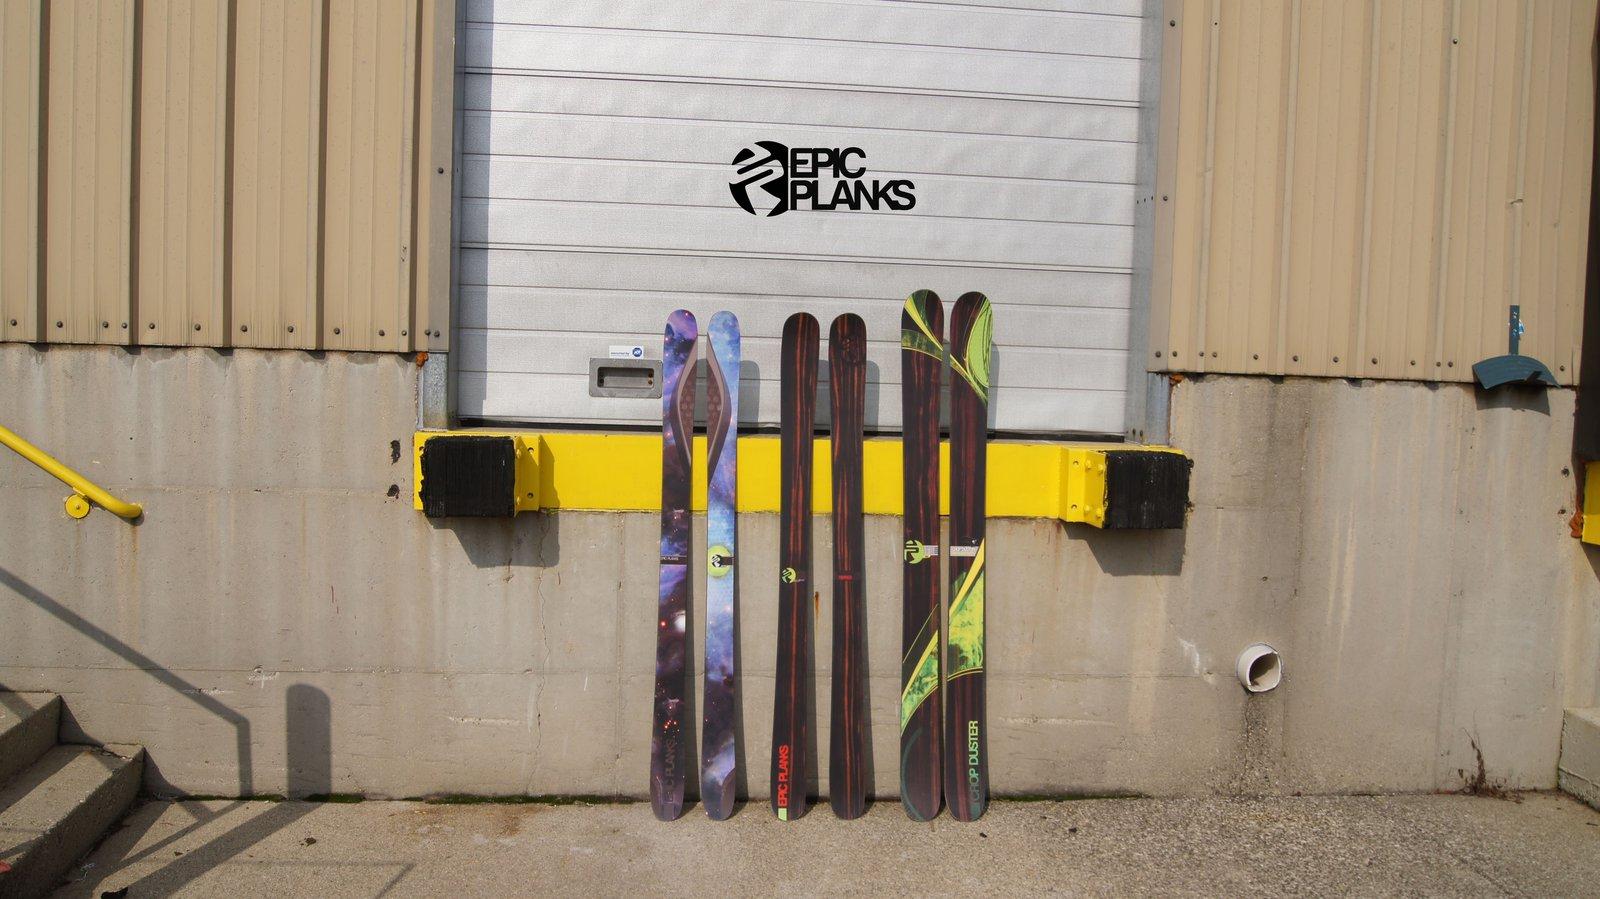 2013 Epic Planks Ski Lineup - Topsheets